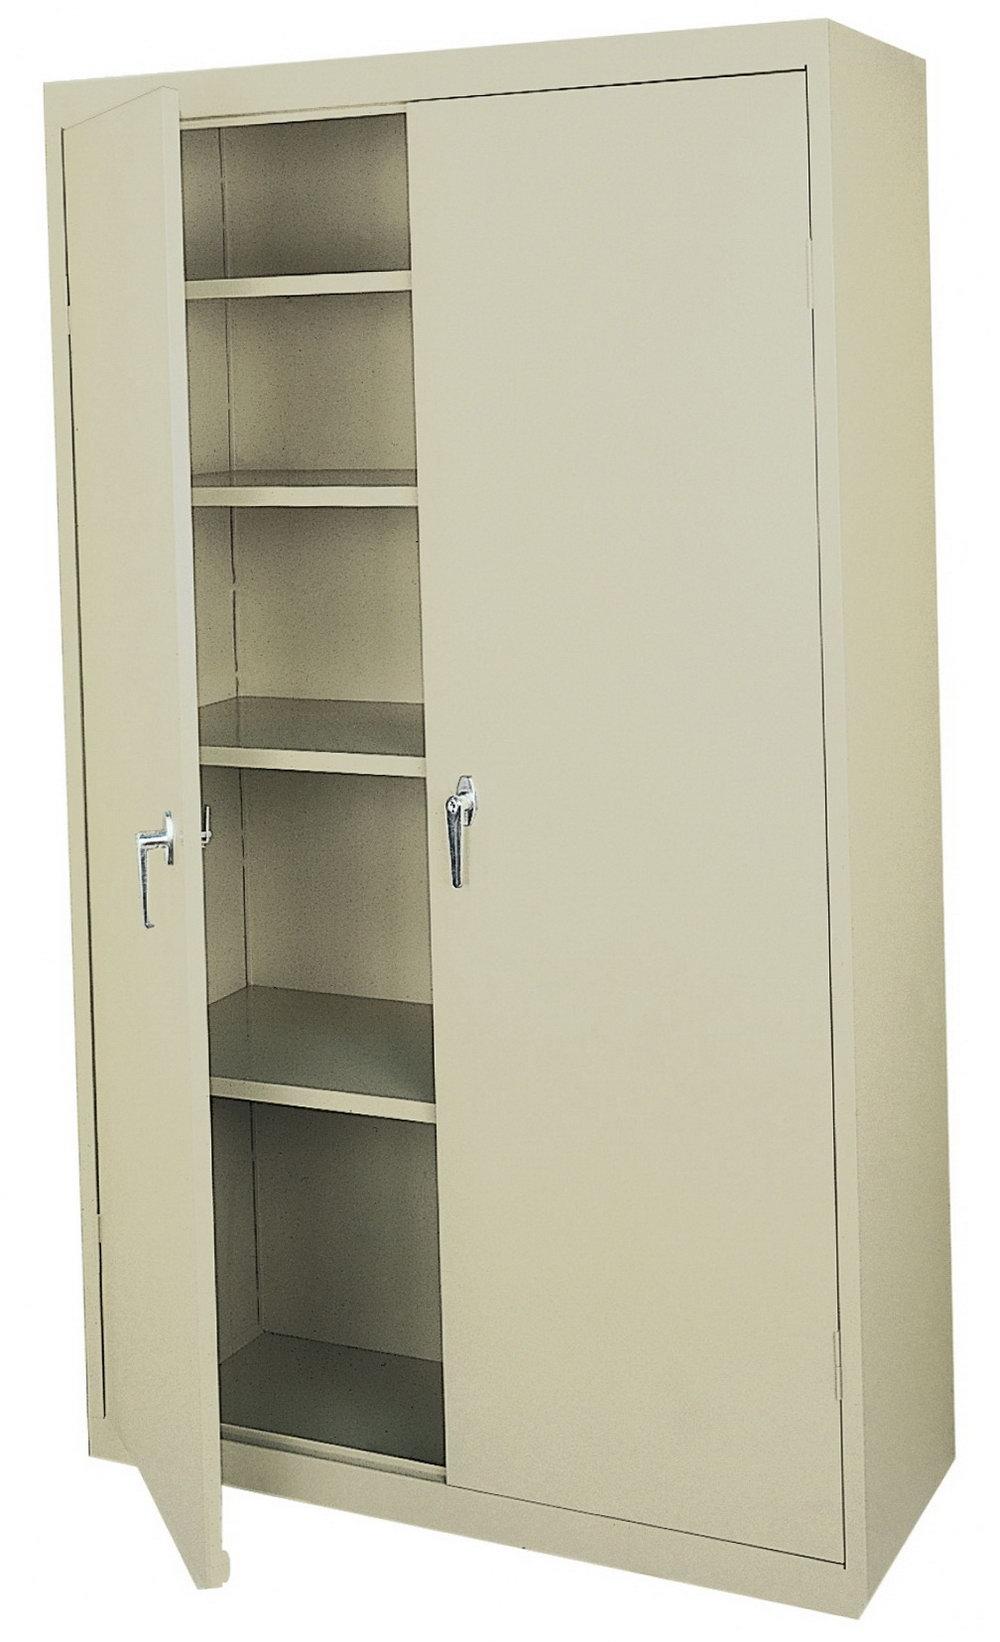 Wall Mounted Garage Storage Cabinets